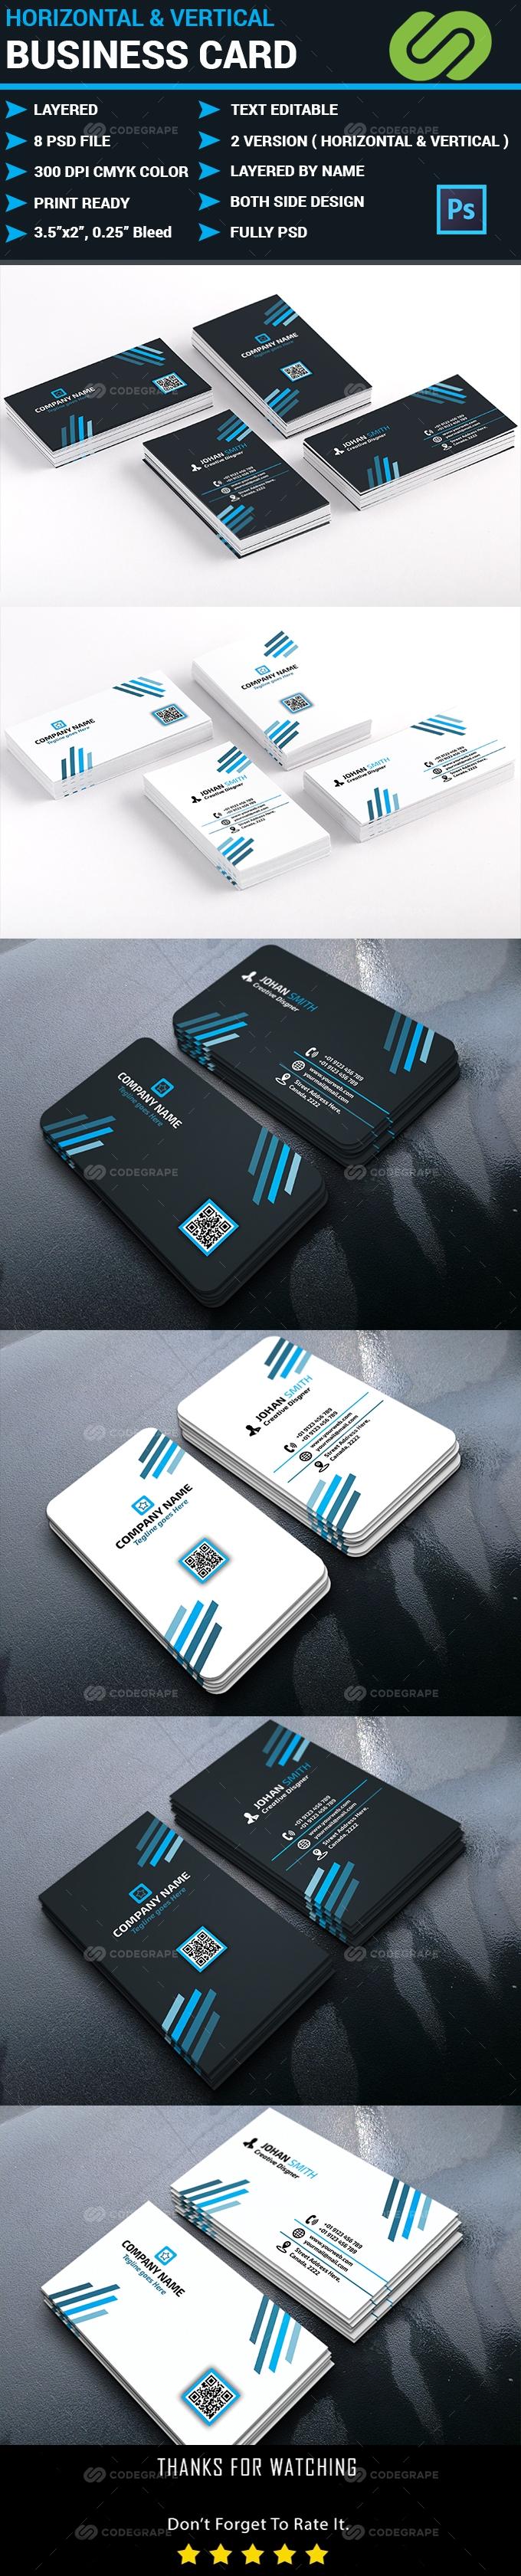 Horizontal & Vertical Business Card